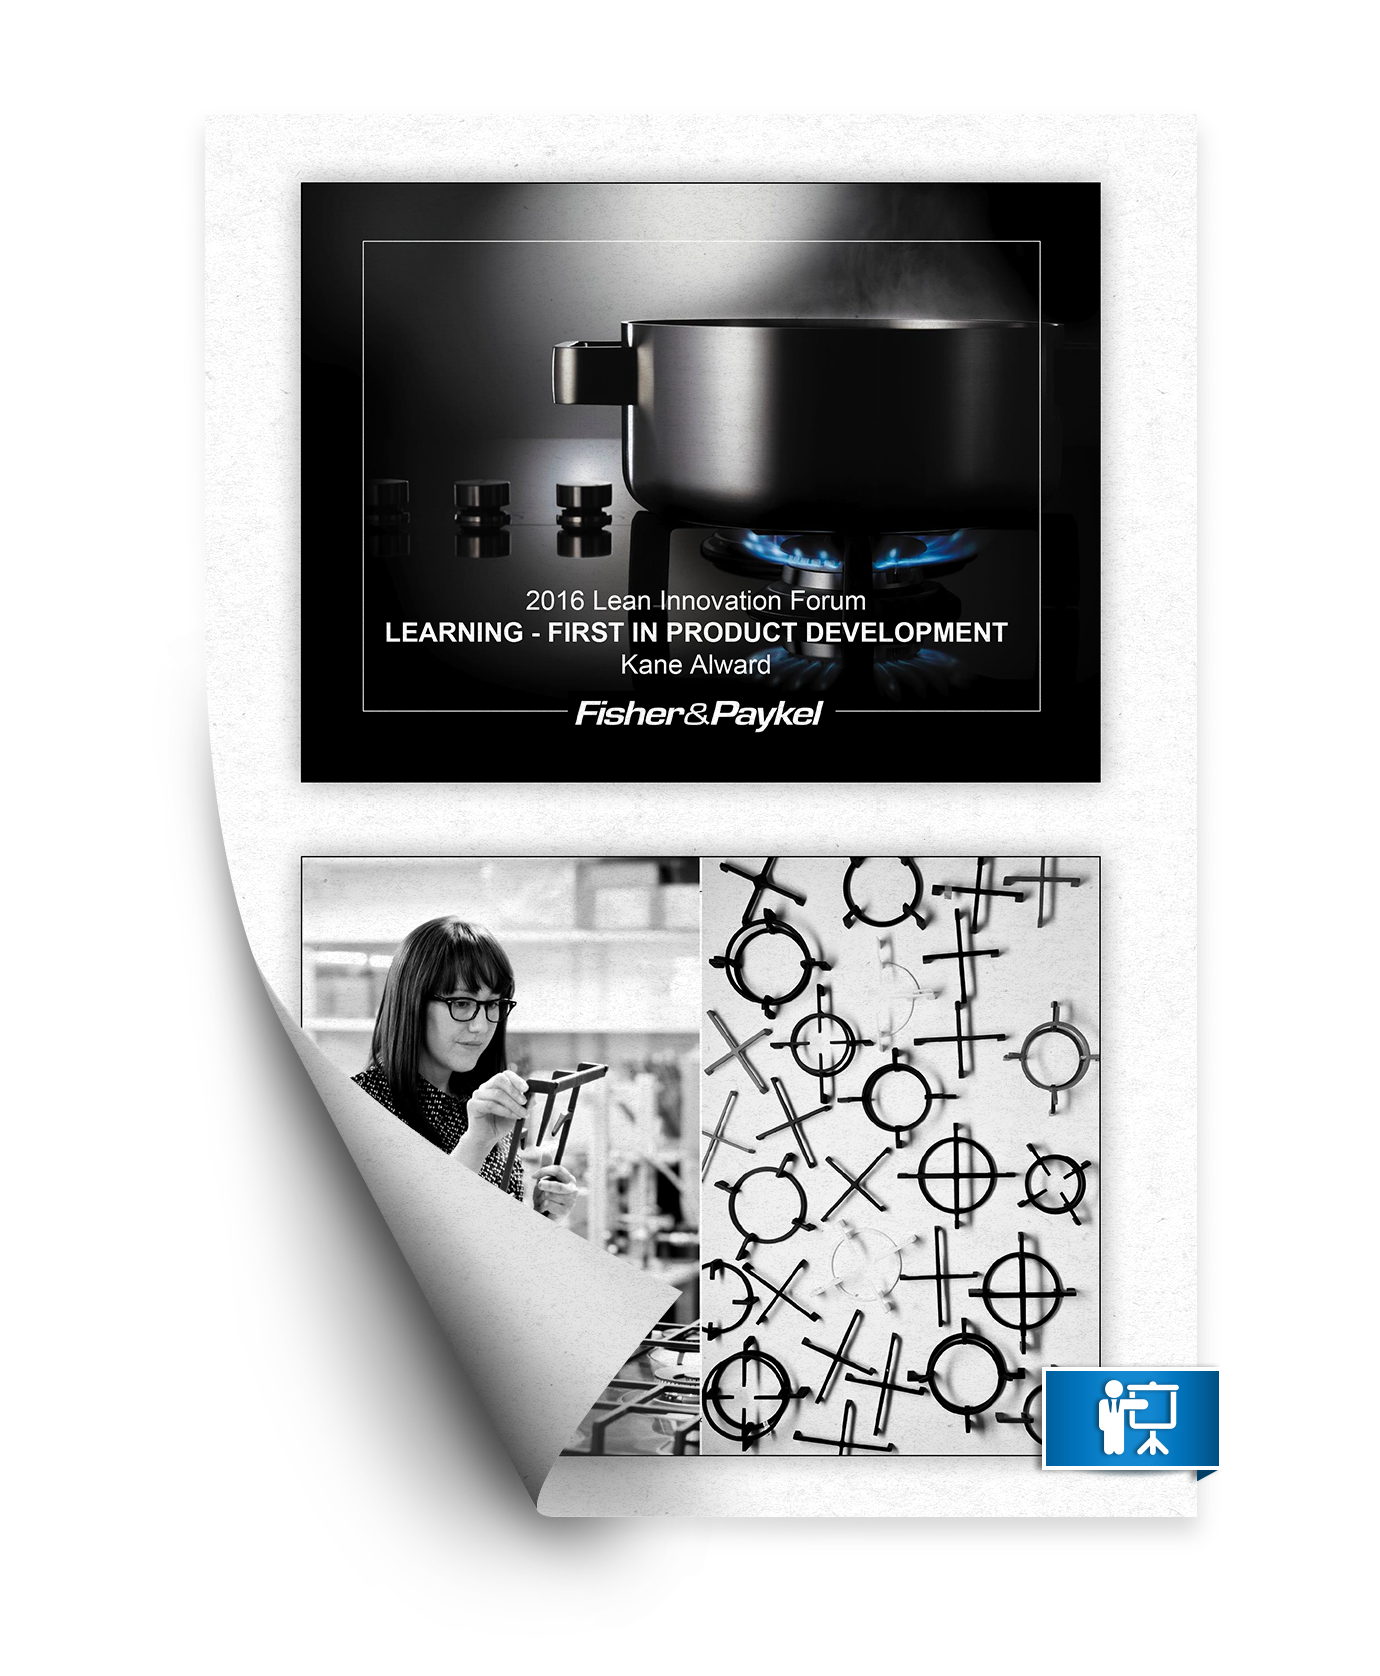 k-library-06-lif2016-fp-presentation